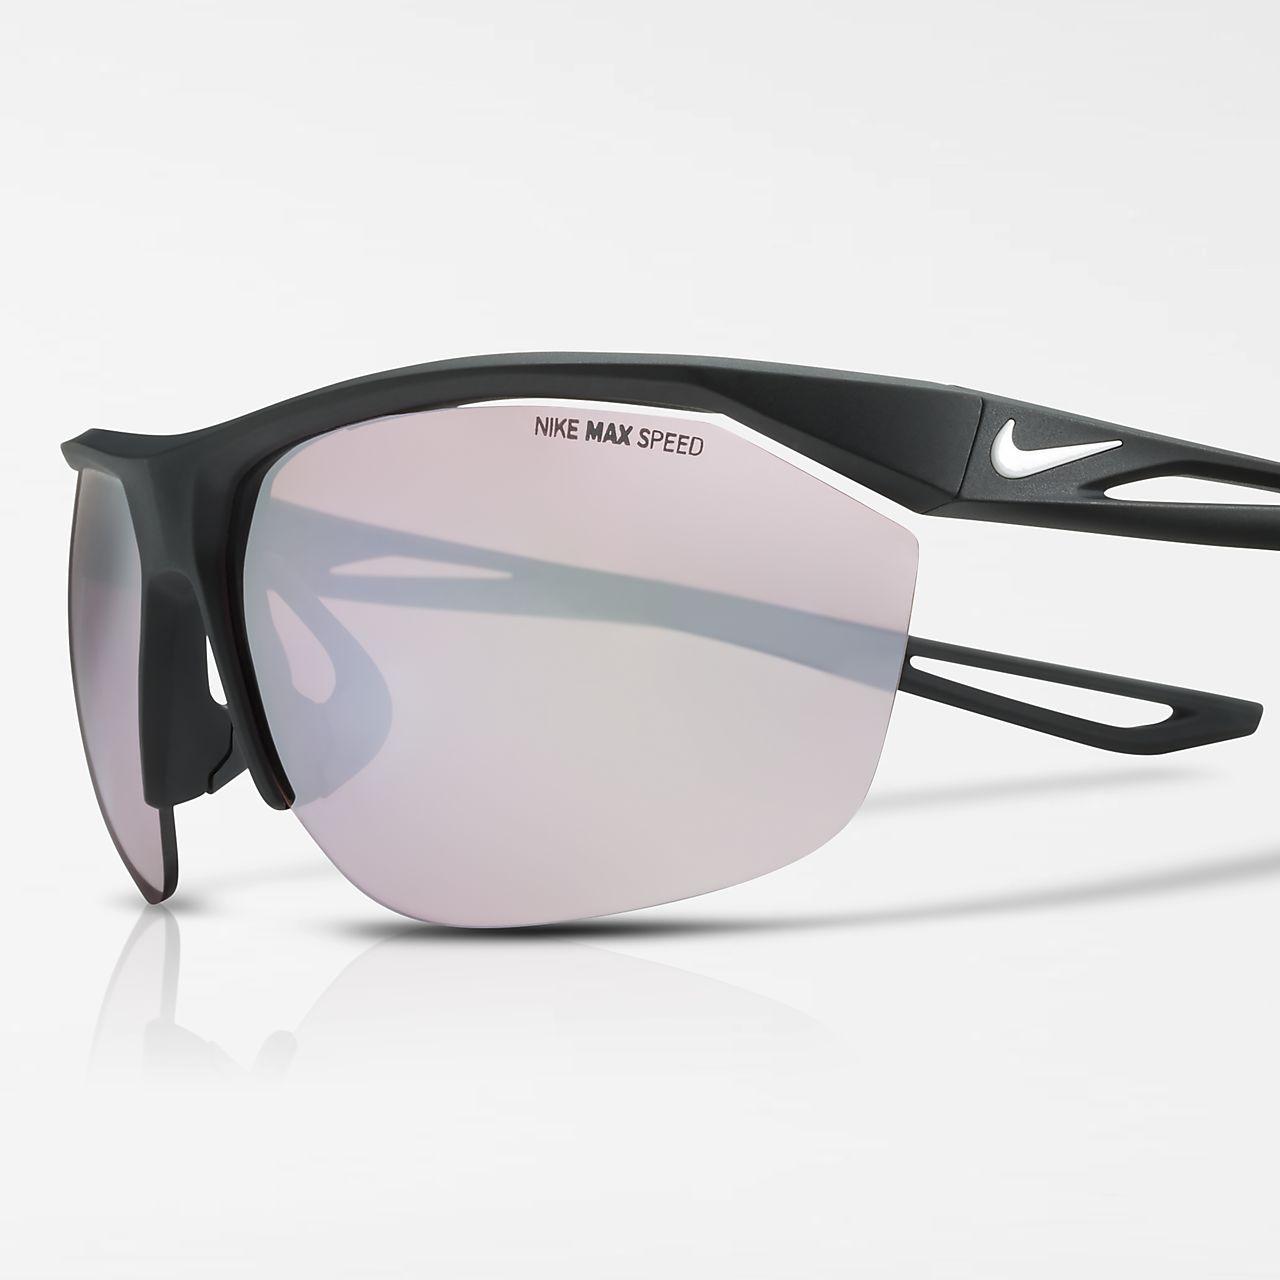 Nike Sonnenbrillen Tailwind E Sonnenbrille pXpgdCk - redboxxdesigns.com